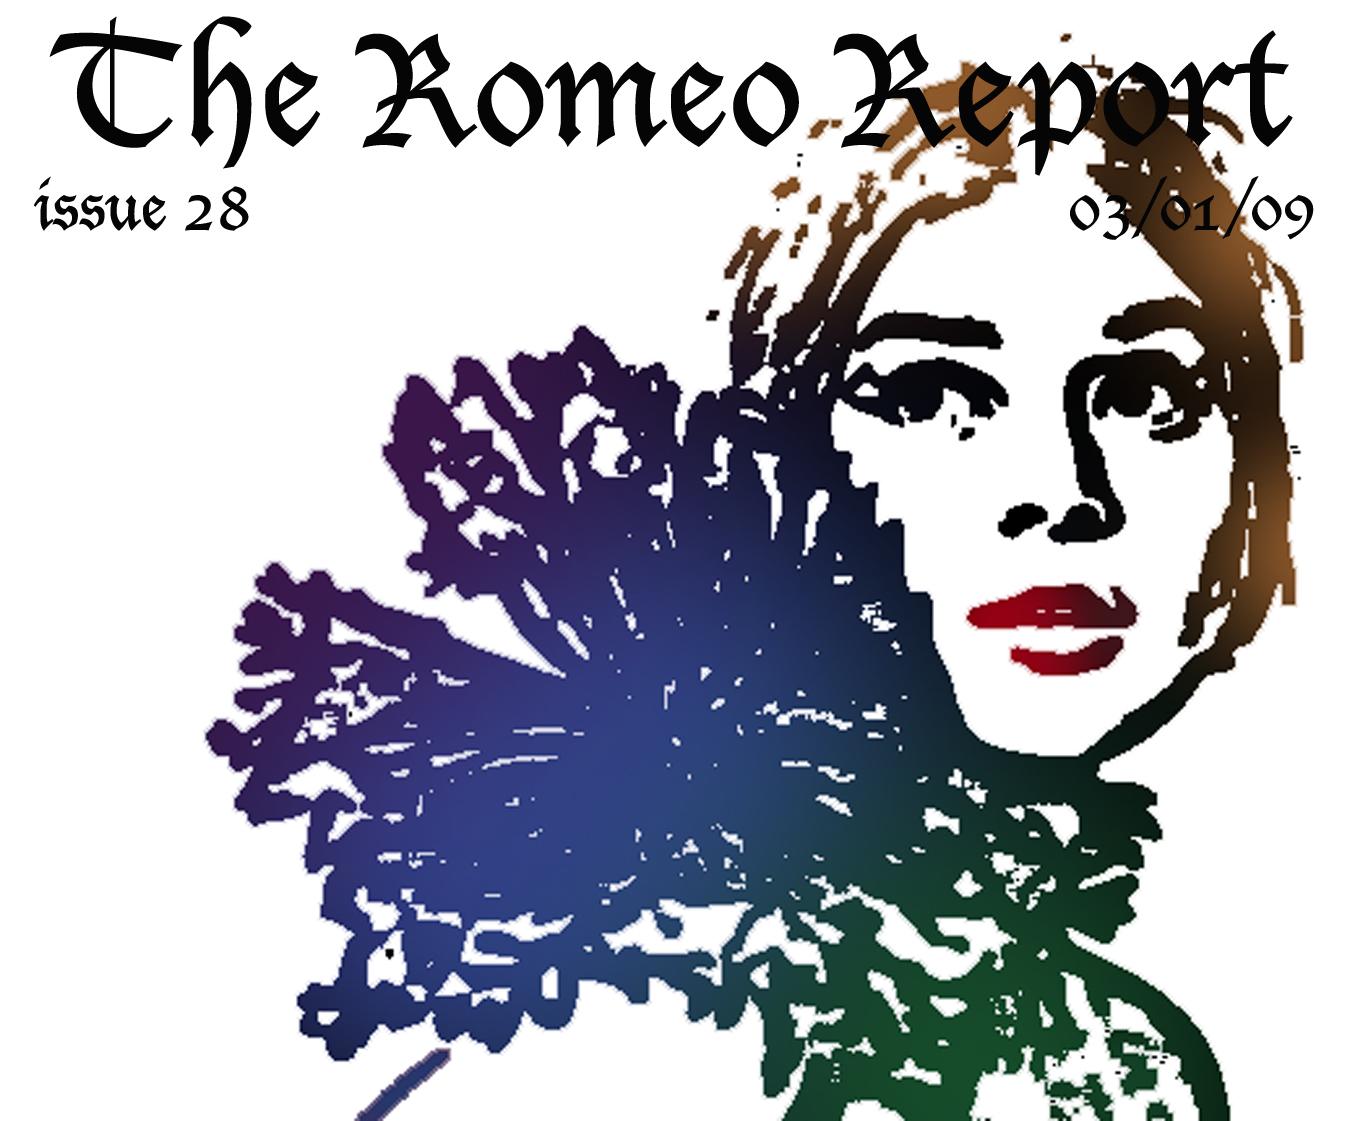 theromeoreport-issue-28